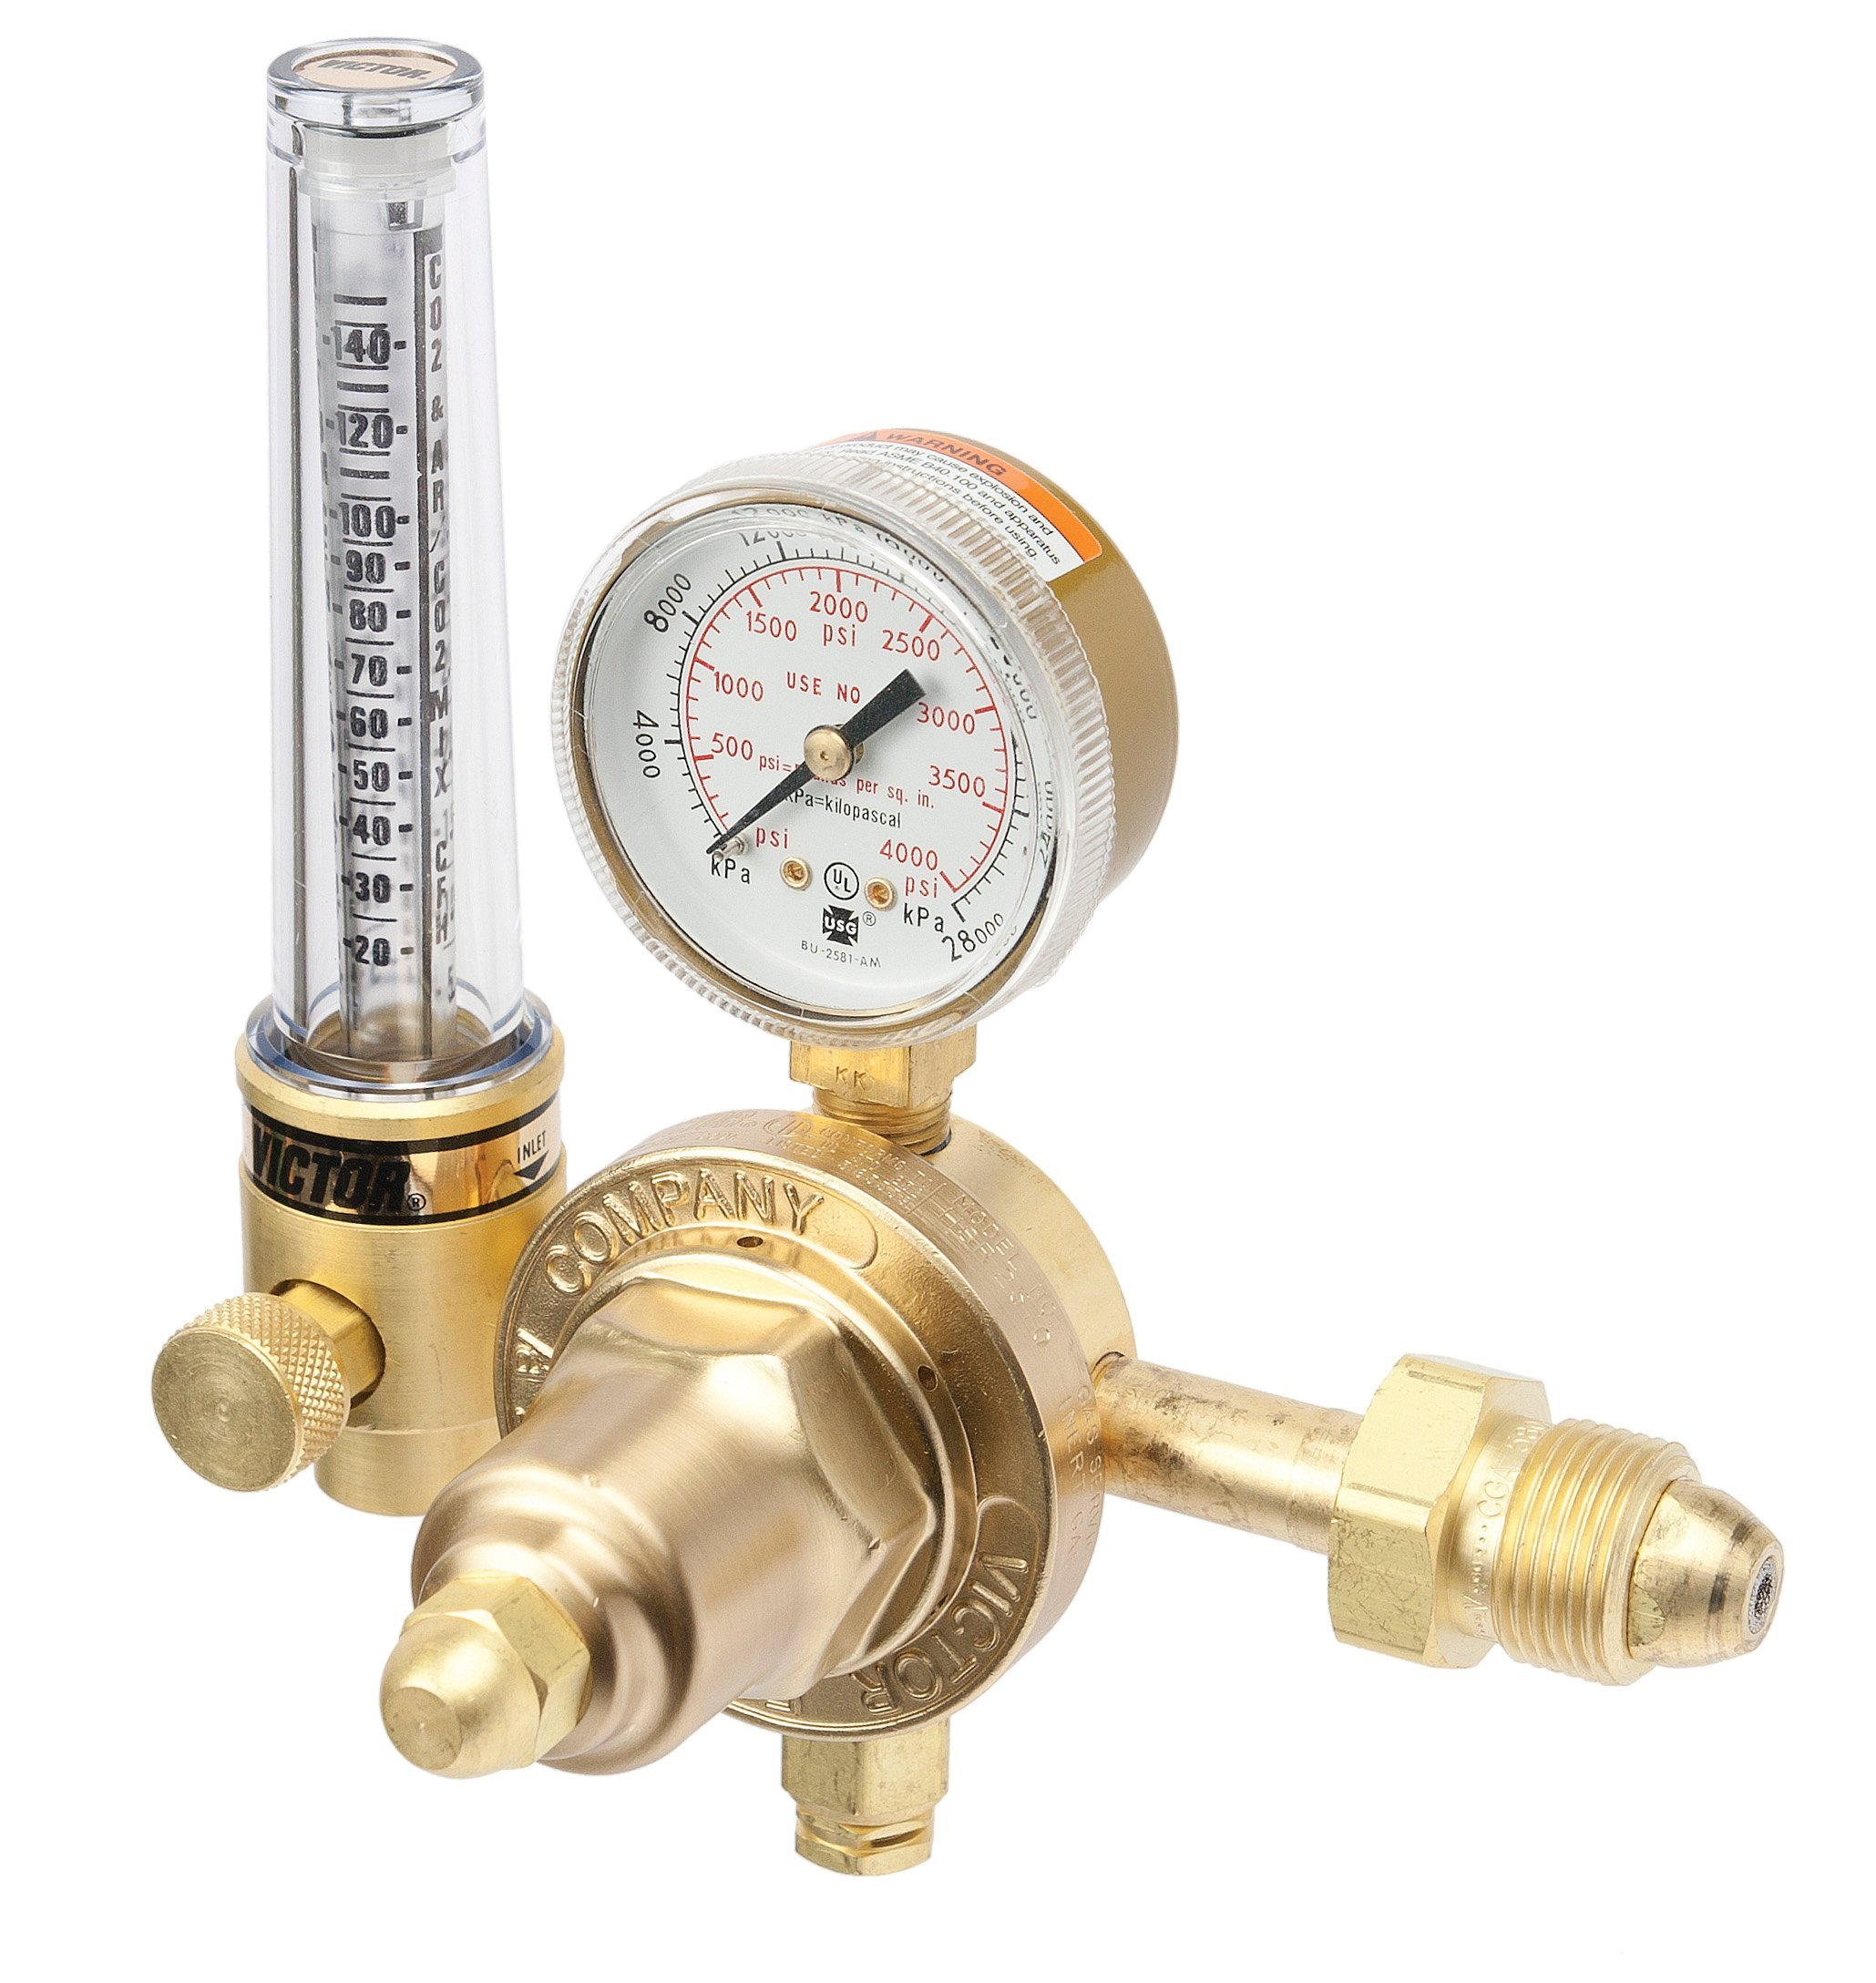 10-50//20-150 SCFH Flow Range Victor Technologies 0781-2731 HRF-2425 Medium Duty Flow Meter Cylinder Argon//Argon//Carbon Dioxide Mix//Helium Regulator